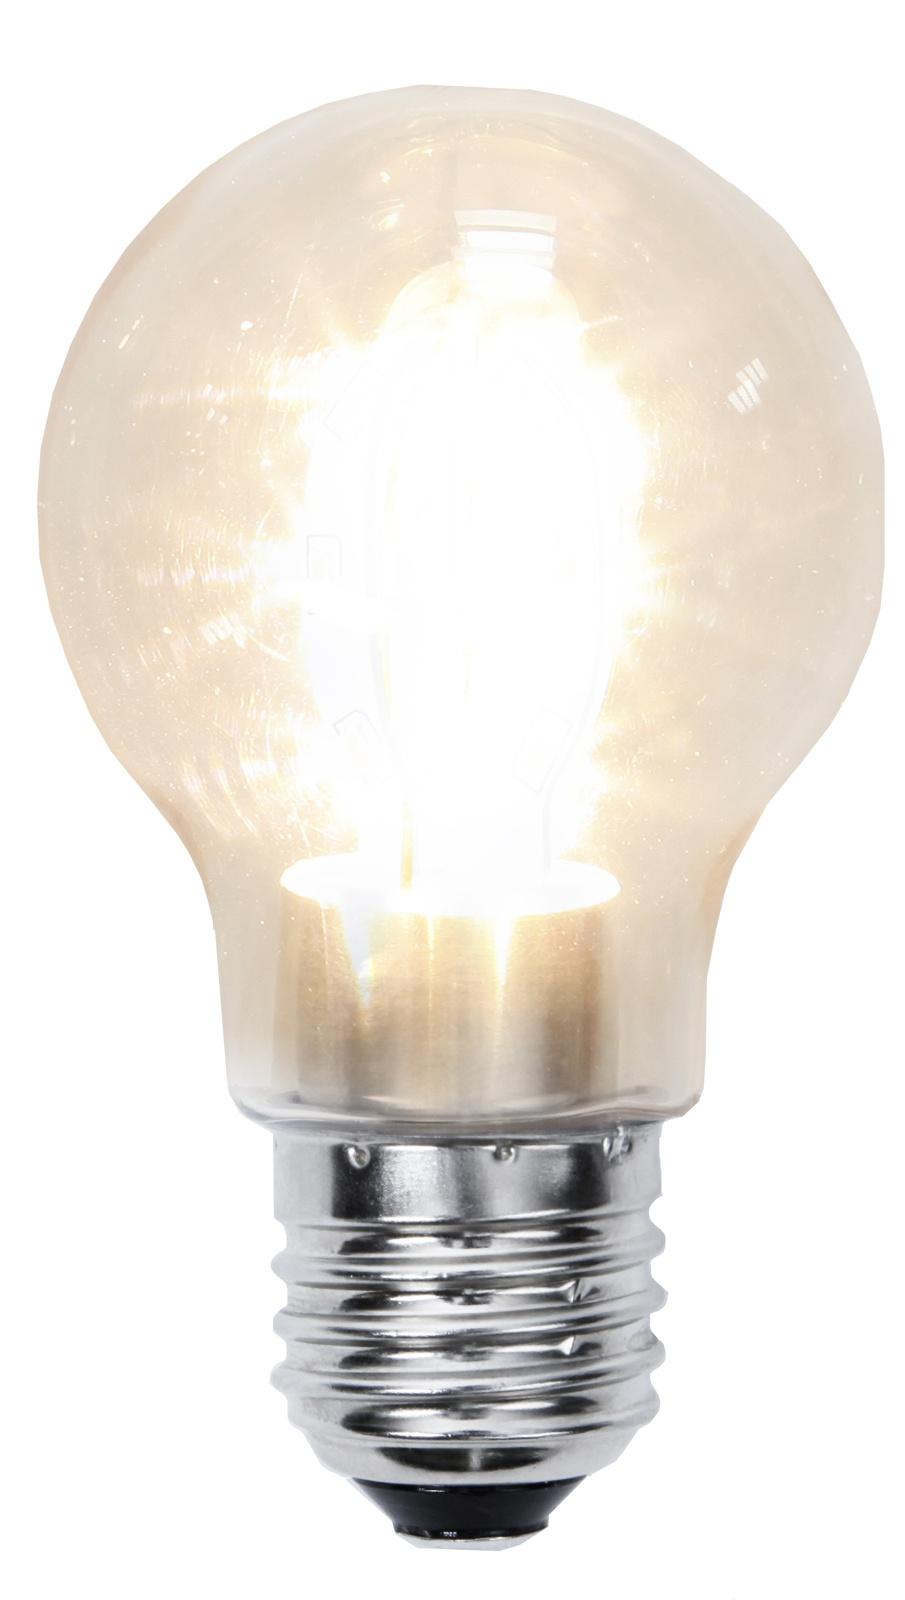 Led Lamppu Hehkulampun Tilalle